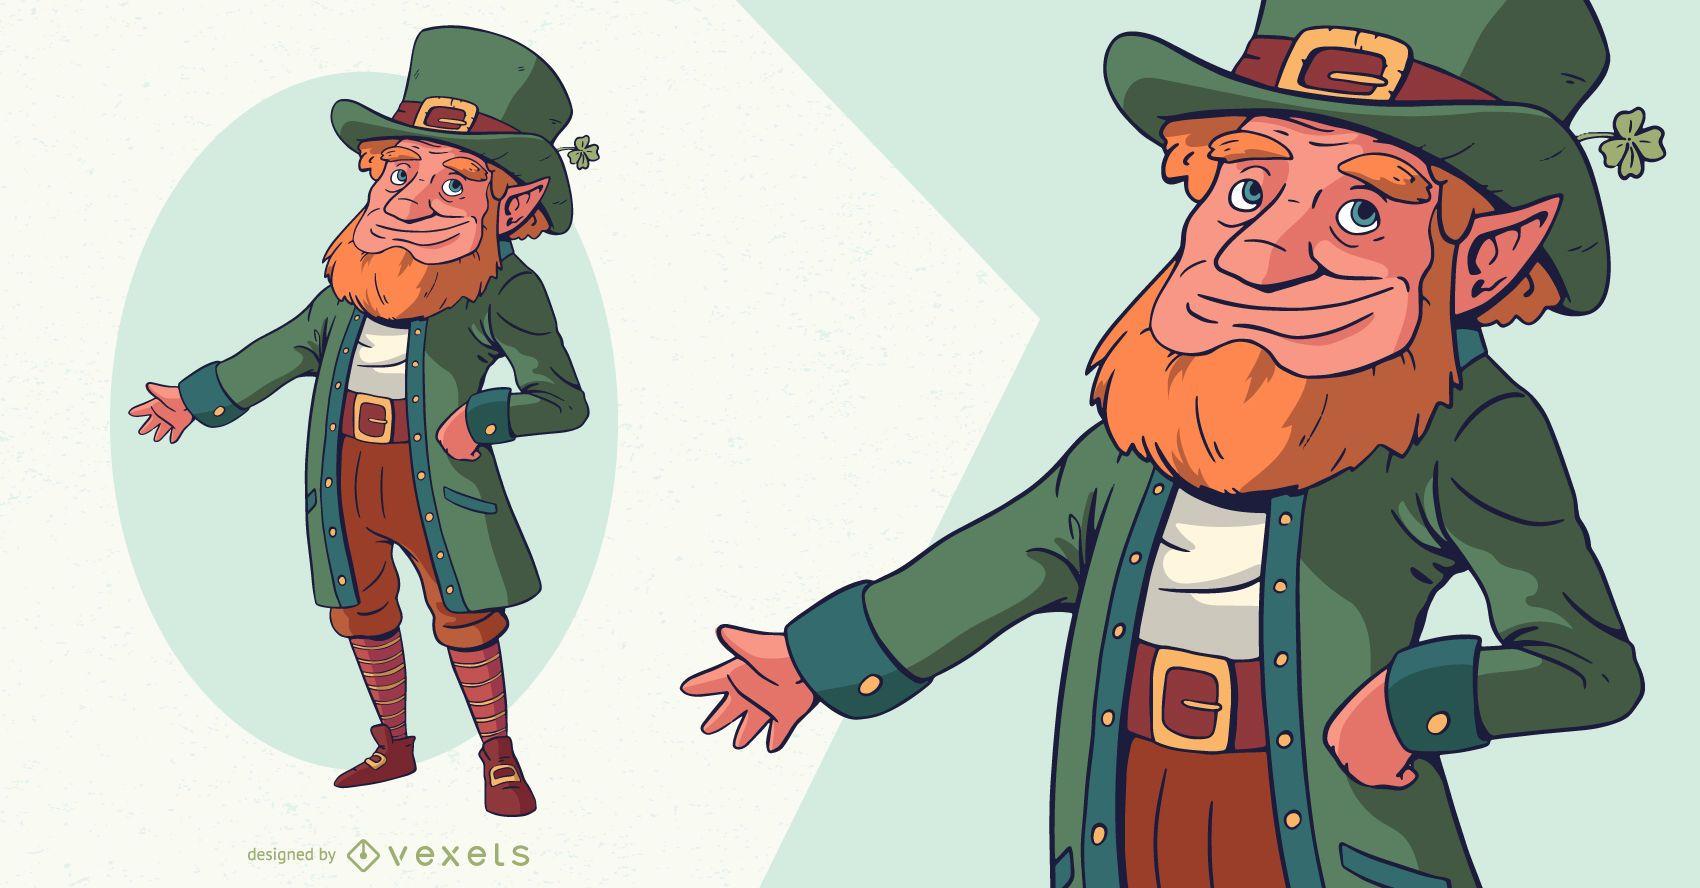 St patrick's day leprechaun character